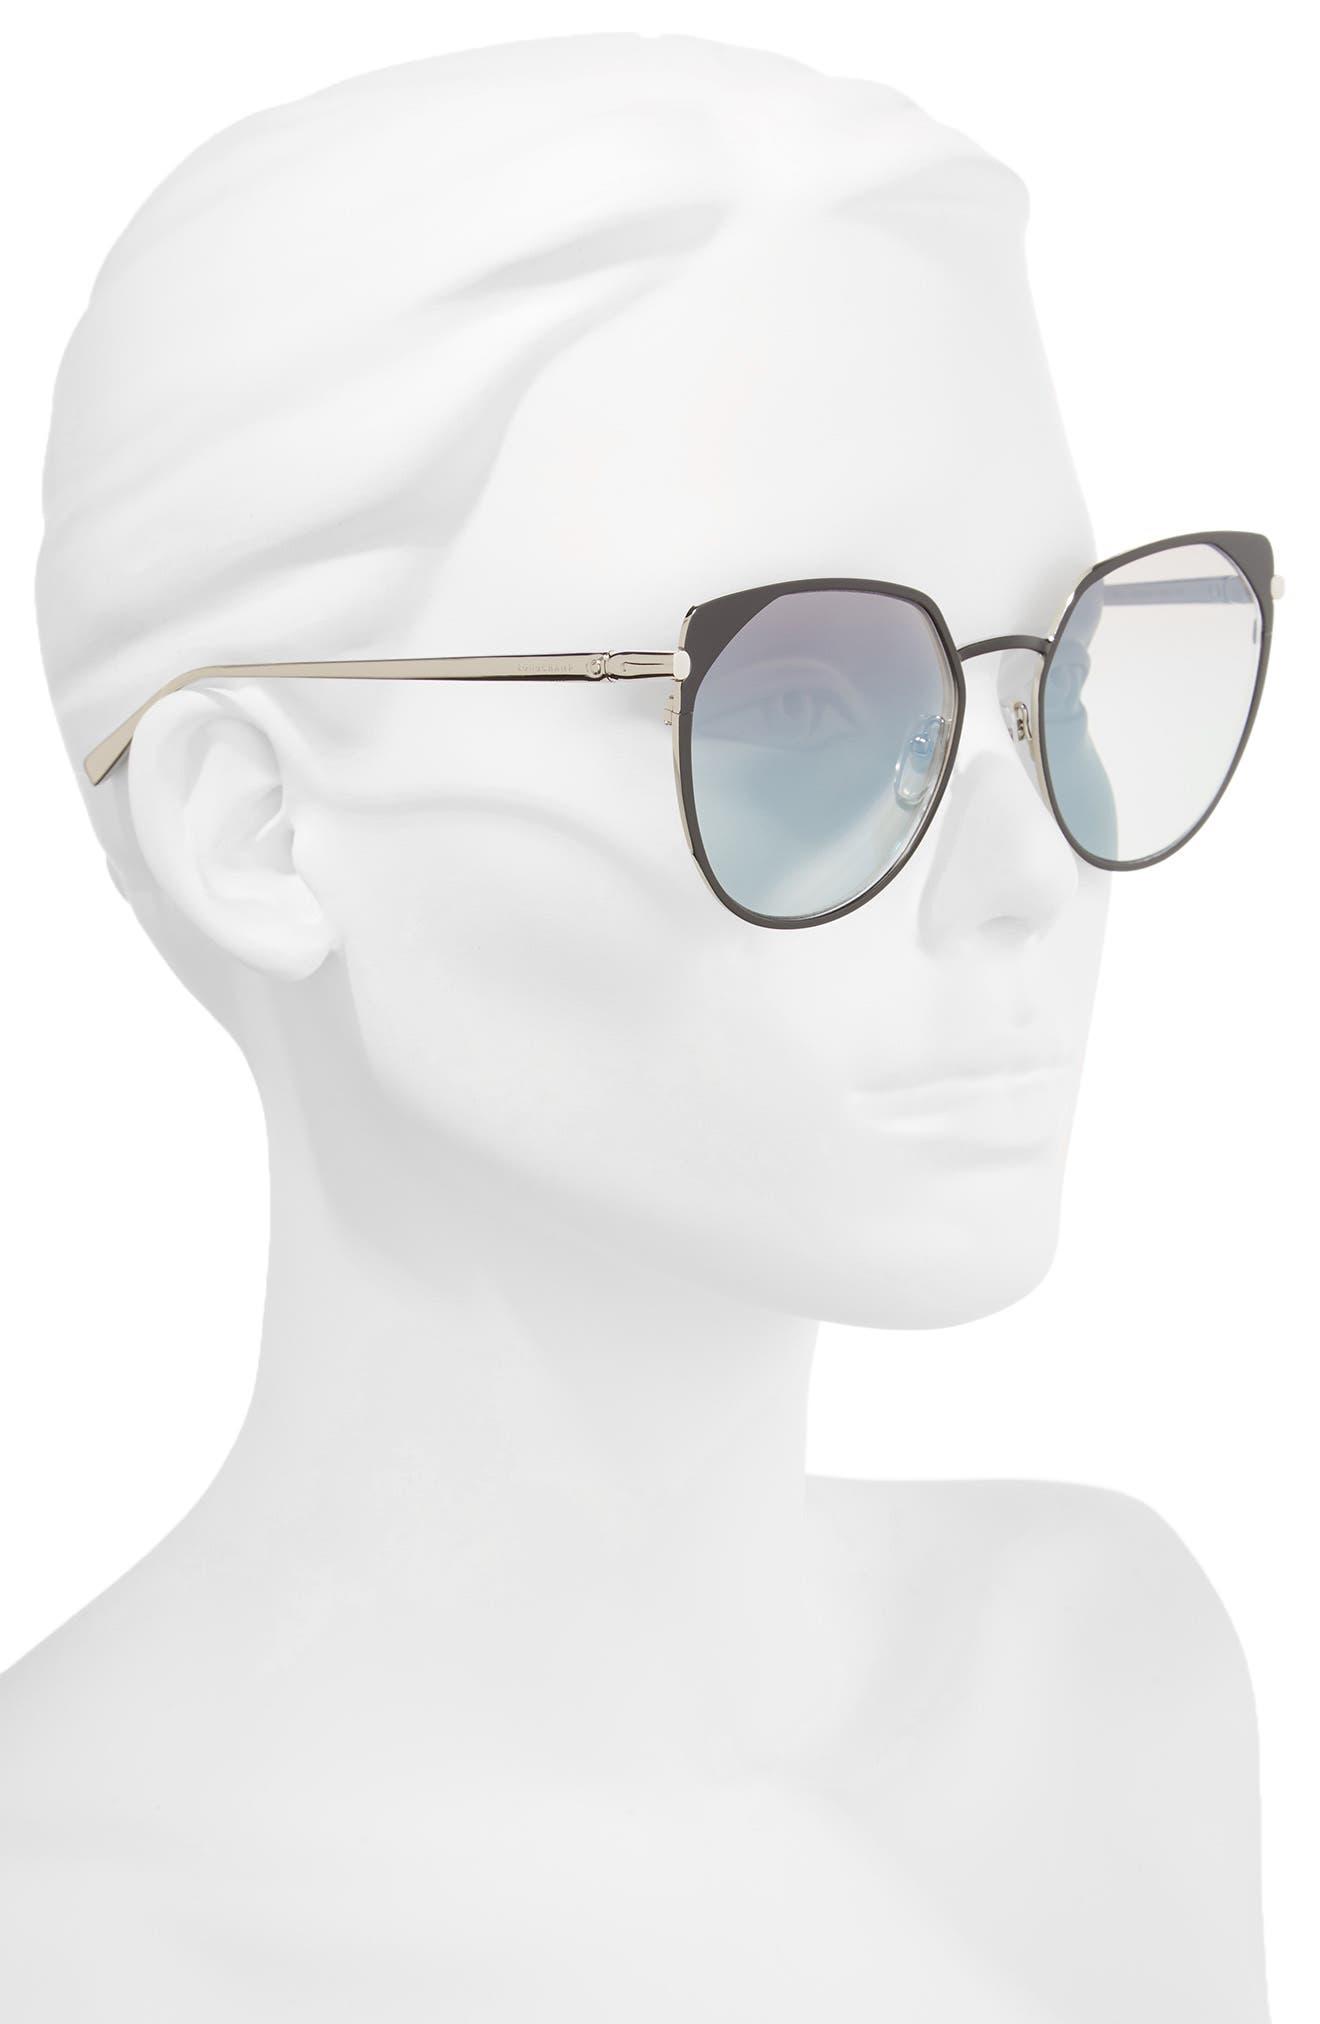 58mm Rounded Cat Eye Sunglasses,                             Alternate thumbnail 2, color,                             001